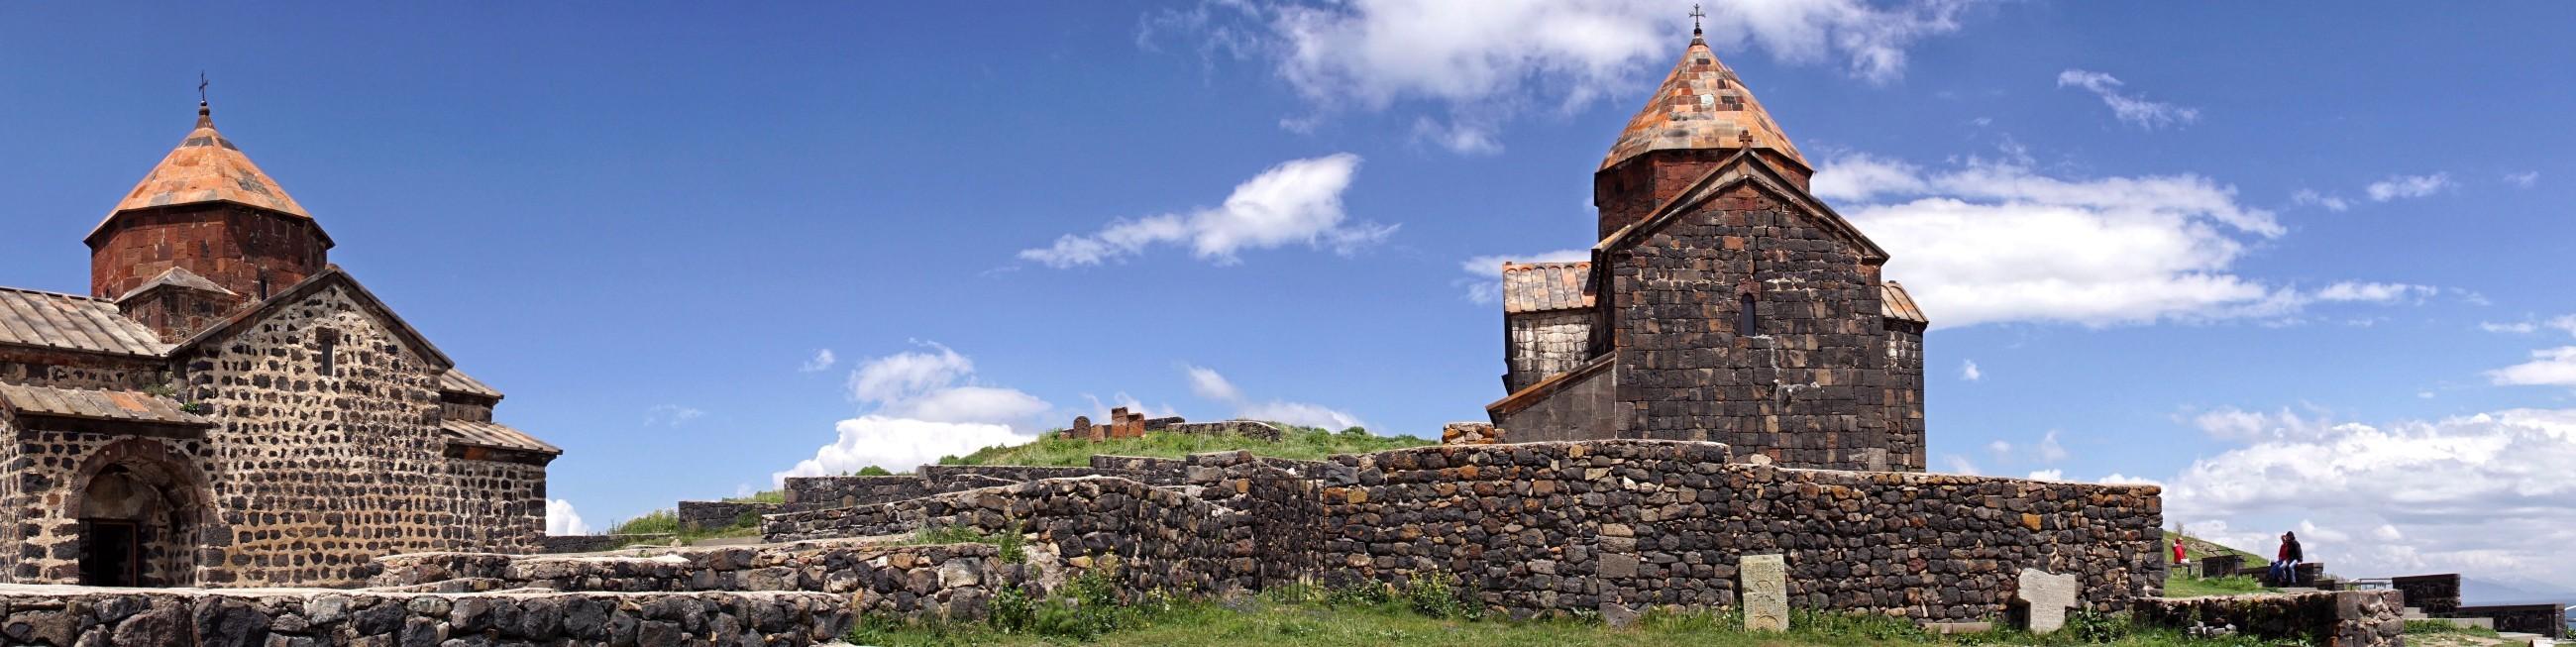 Armenia to niesamowite klasztory